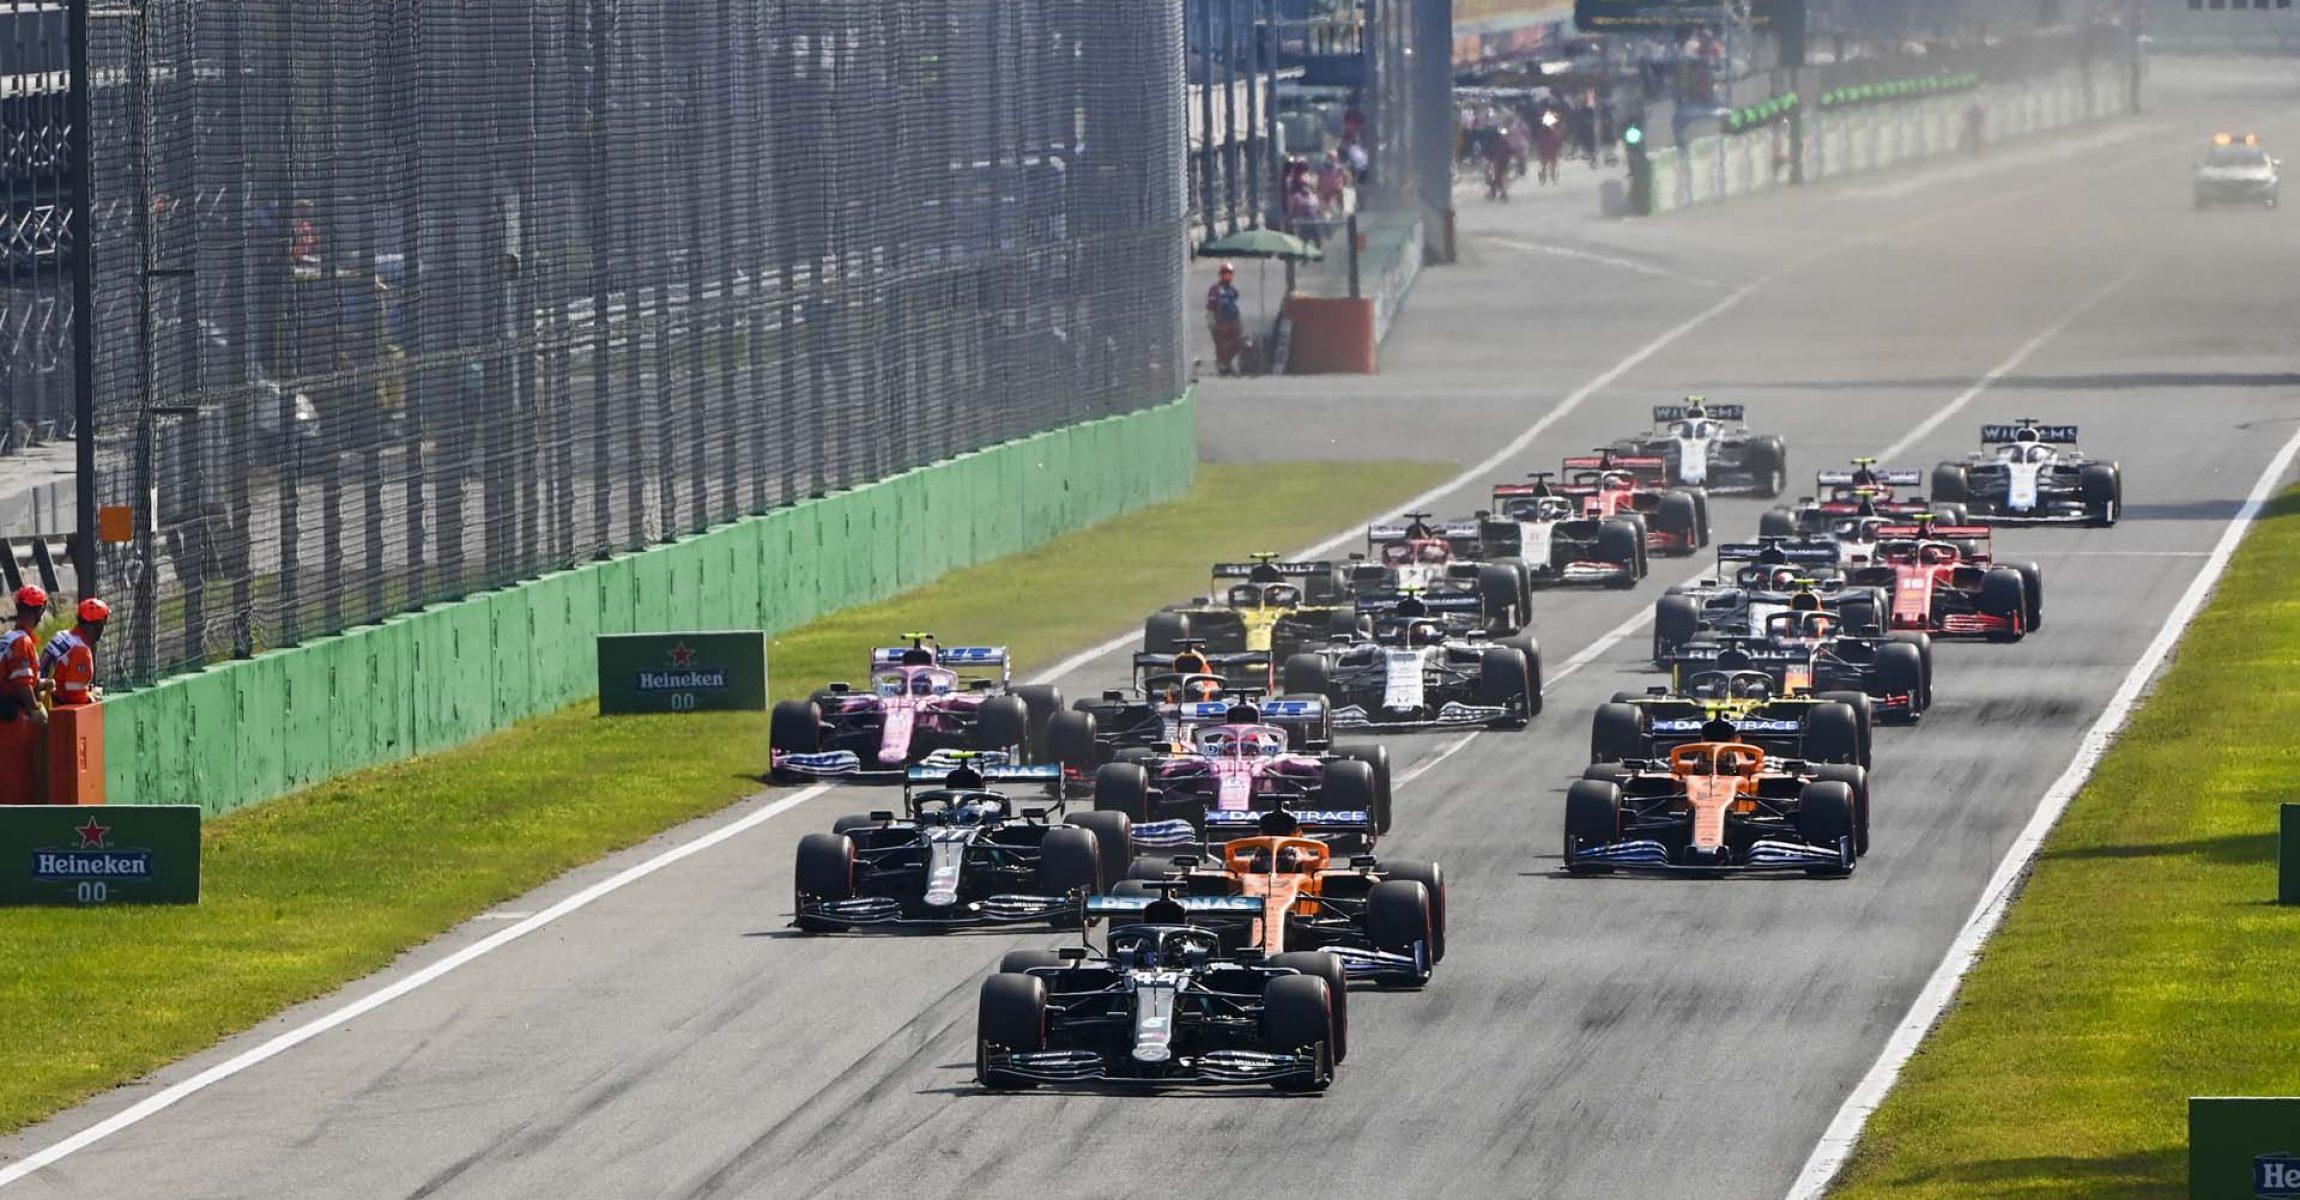 2020 Italian Grand Prix, Sunday - LAT Images start